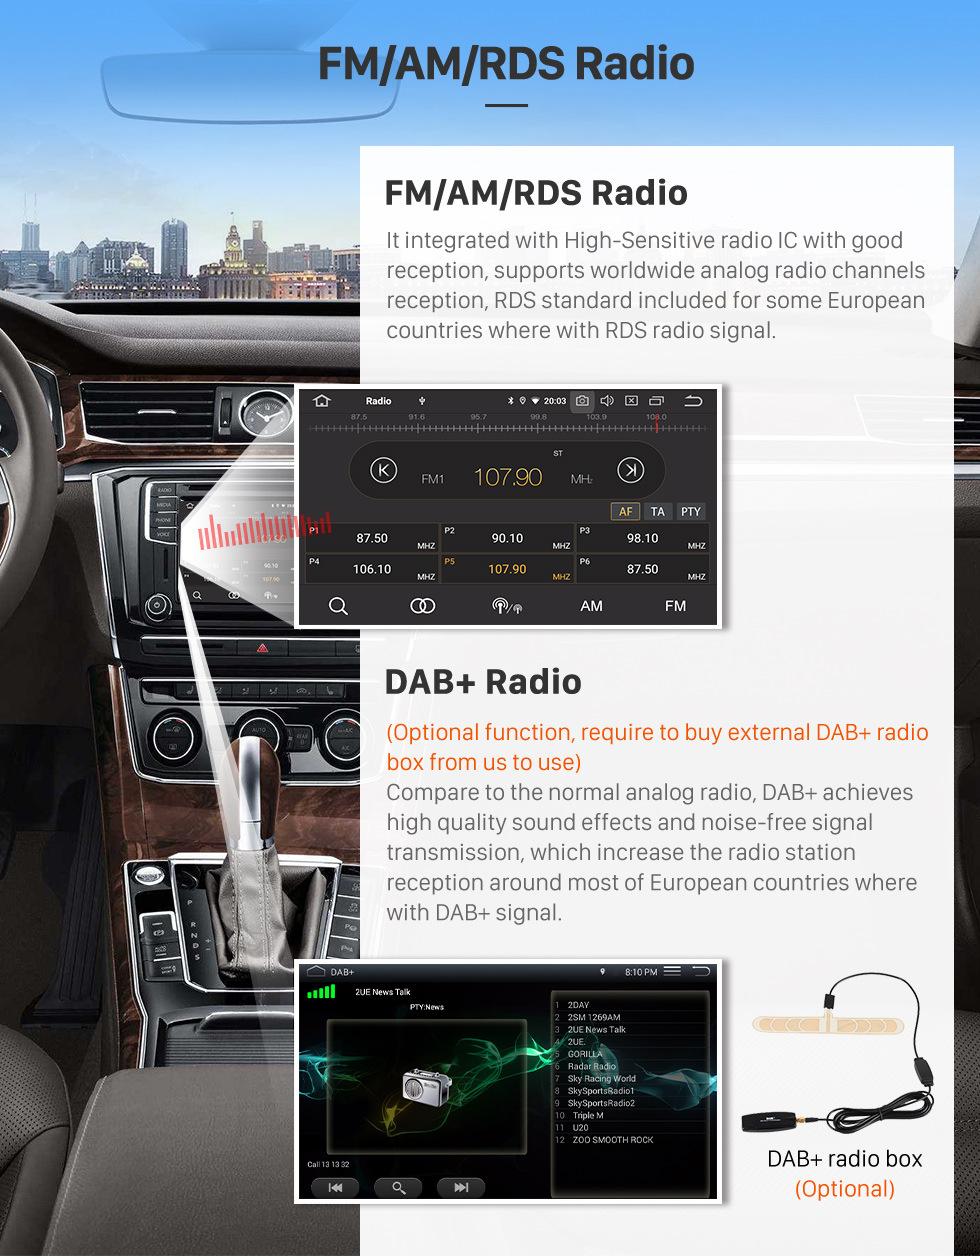 Seicane 7 inch 2004-2012 Opel Zafira/Vectra/Antara/Astra/Corsa Android 10.0 GPS Navigation Radio Bluetooth HD Touchscreen WIFI Carplay support DAB+ OBD